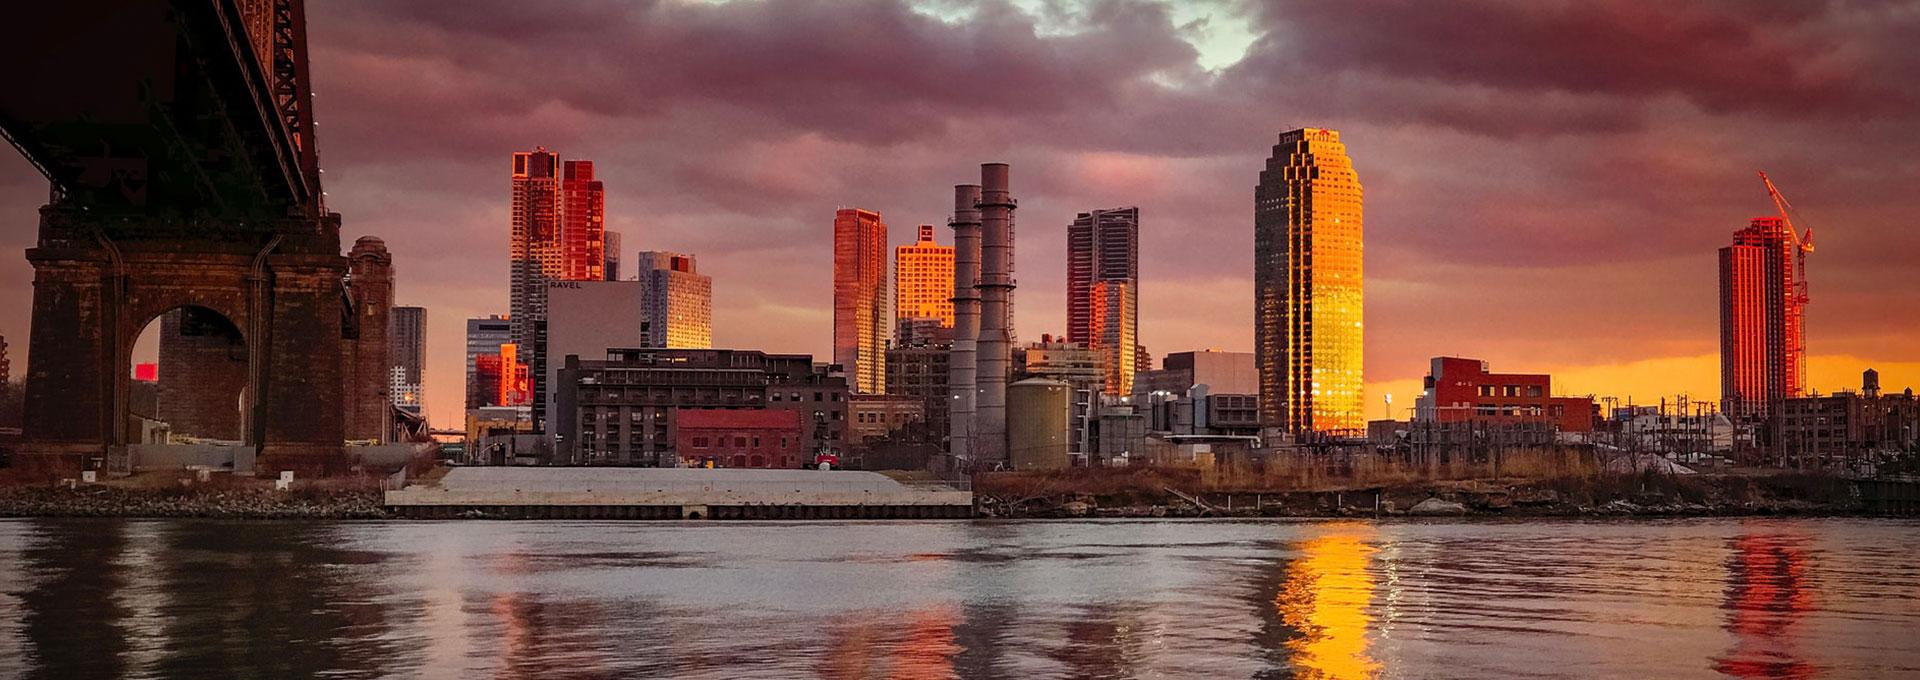 city business district skyline